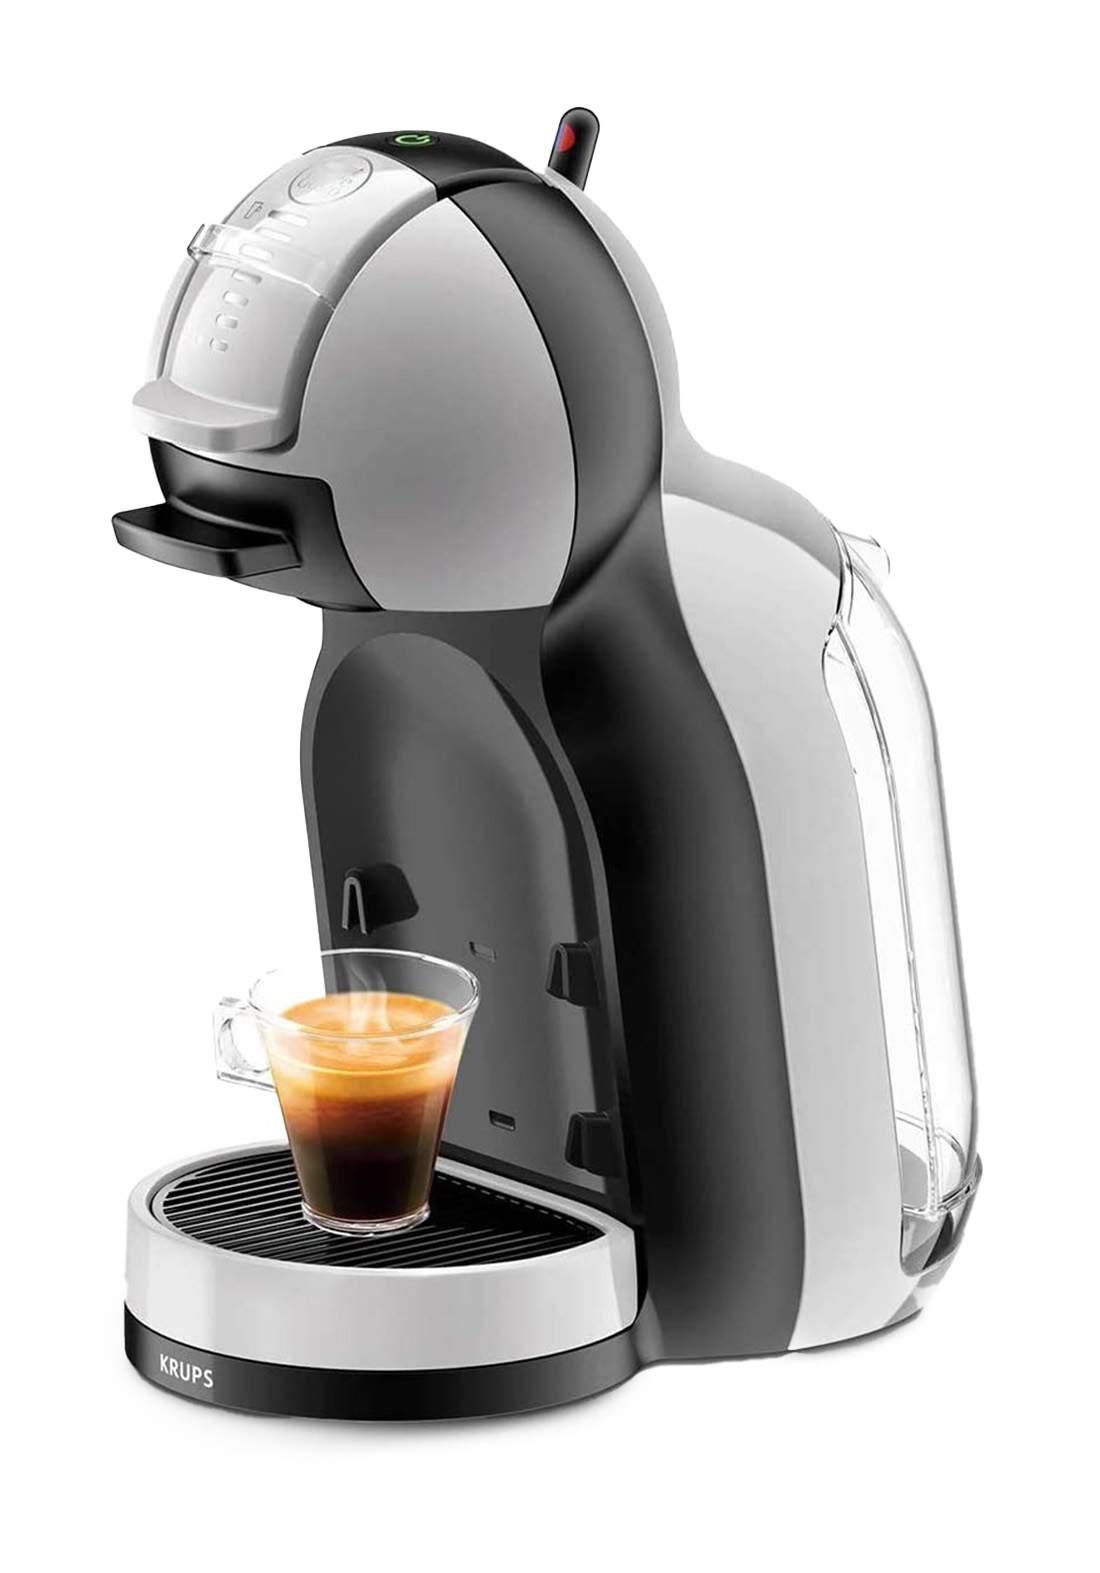 Krups KP123B Coffee Machine 1500 Watt ماكنة صنع قهوة